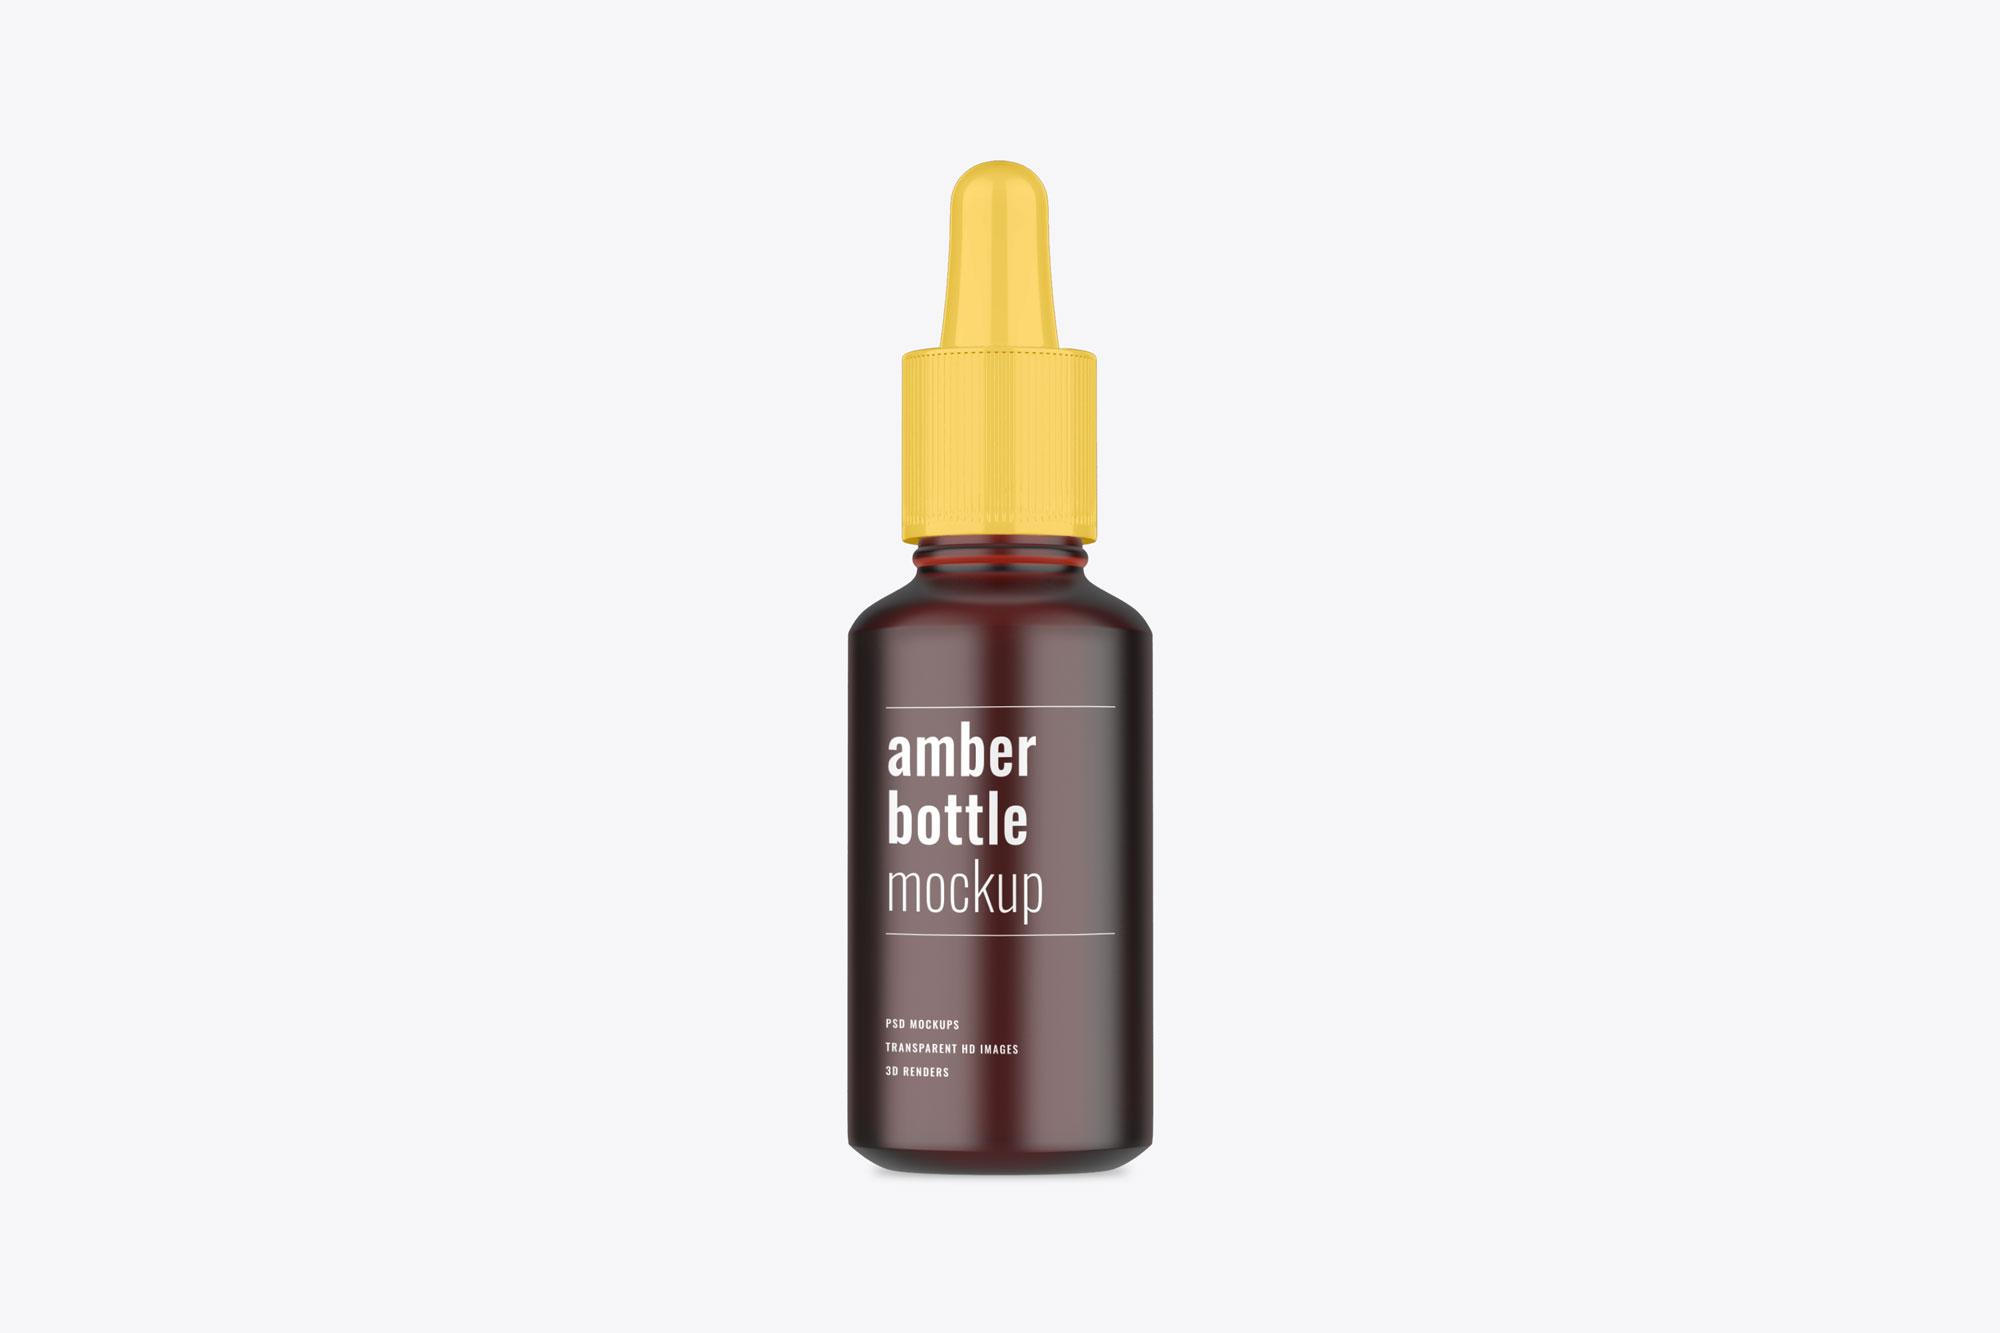 Dropper Bottle Psd Mockup - Mockup Daddy